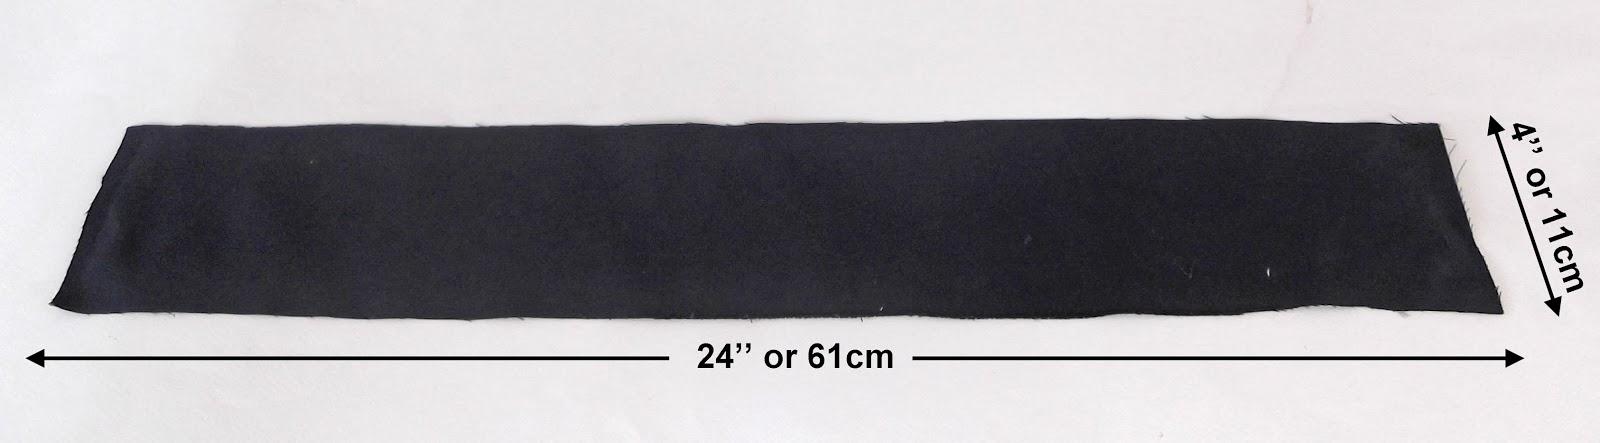 bag handles dimensions, bag handles measurements, How long are bag handles,